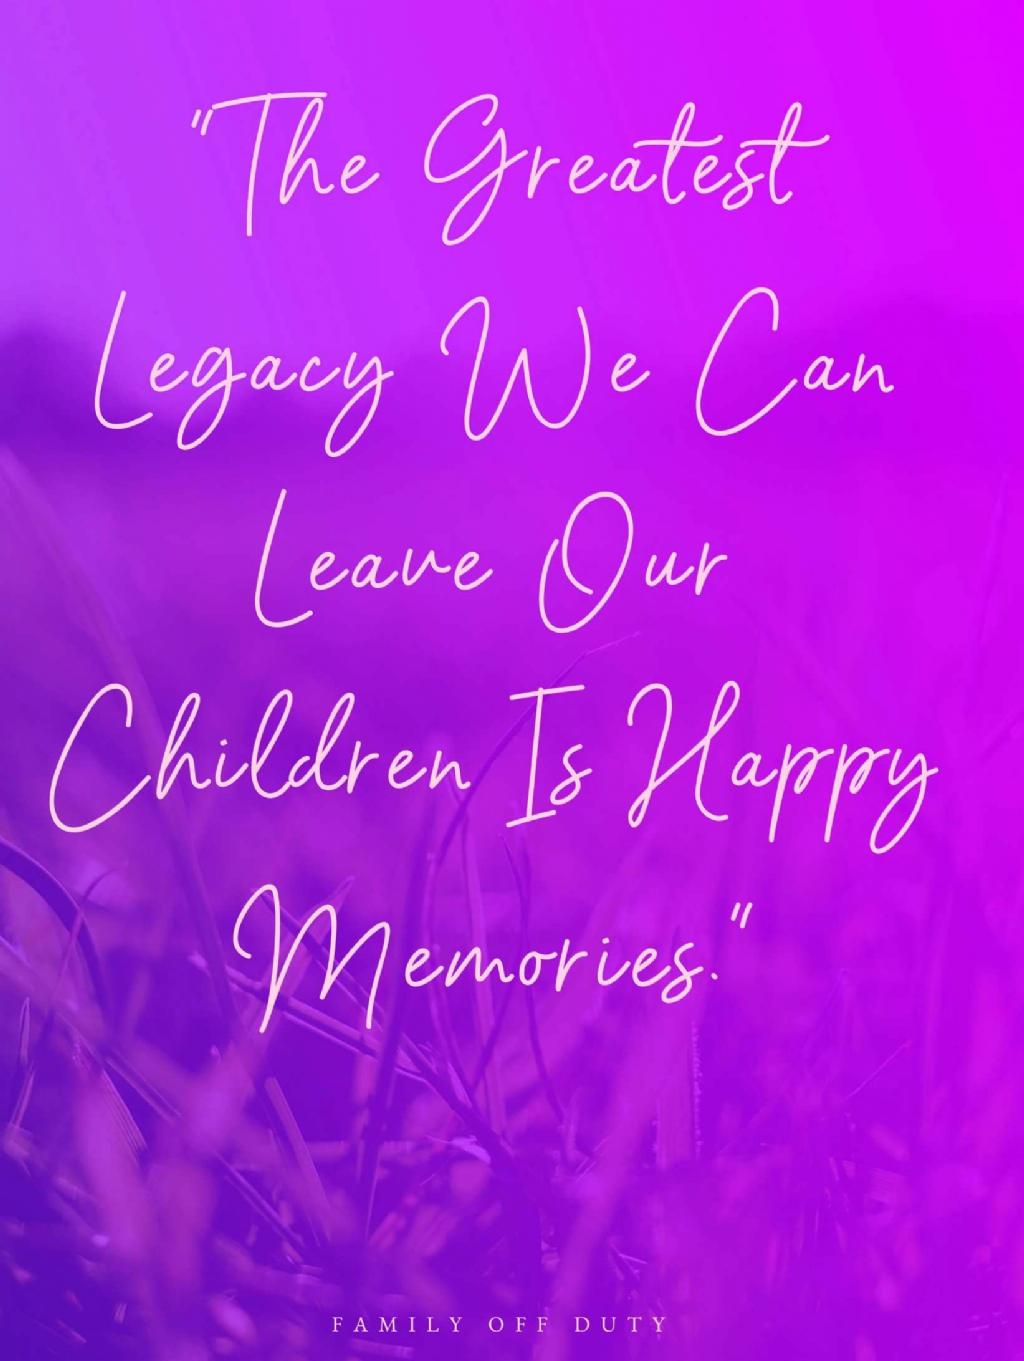 15 Family Photo Album Quotes Family Quotesjoke Com In 2020 Family Holiday Quotes Family Vacation Quotes Holiday Quotes